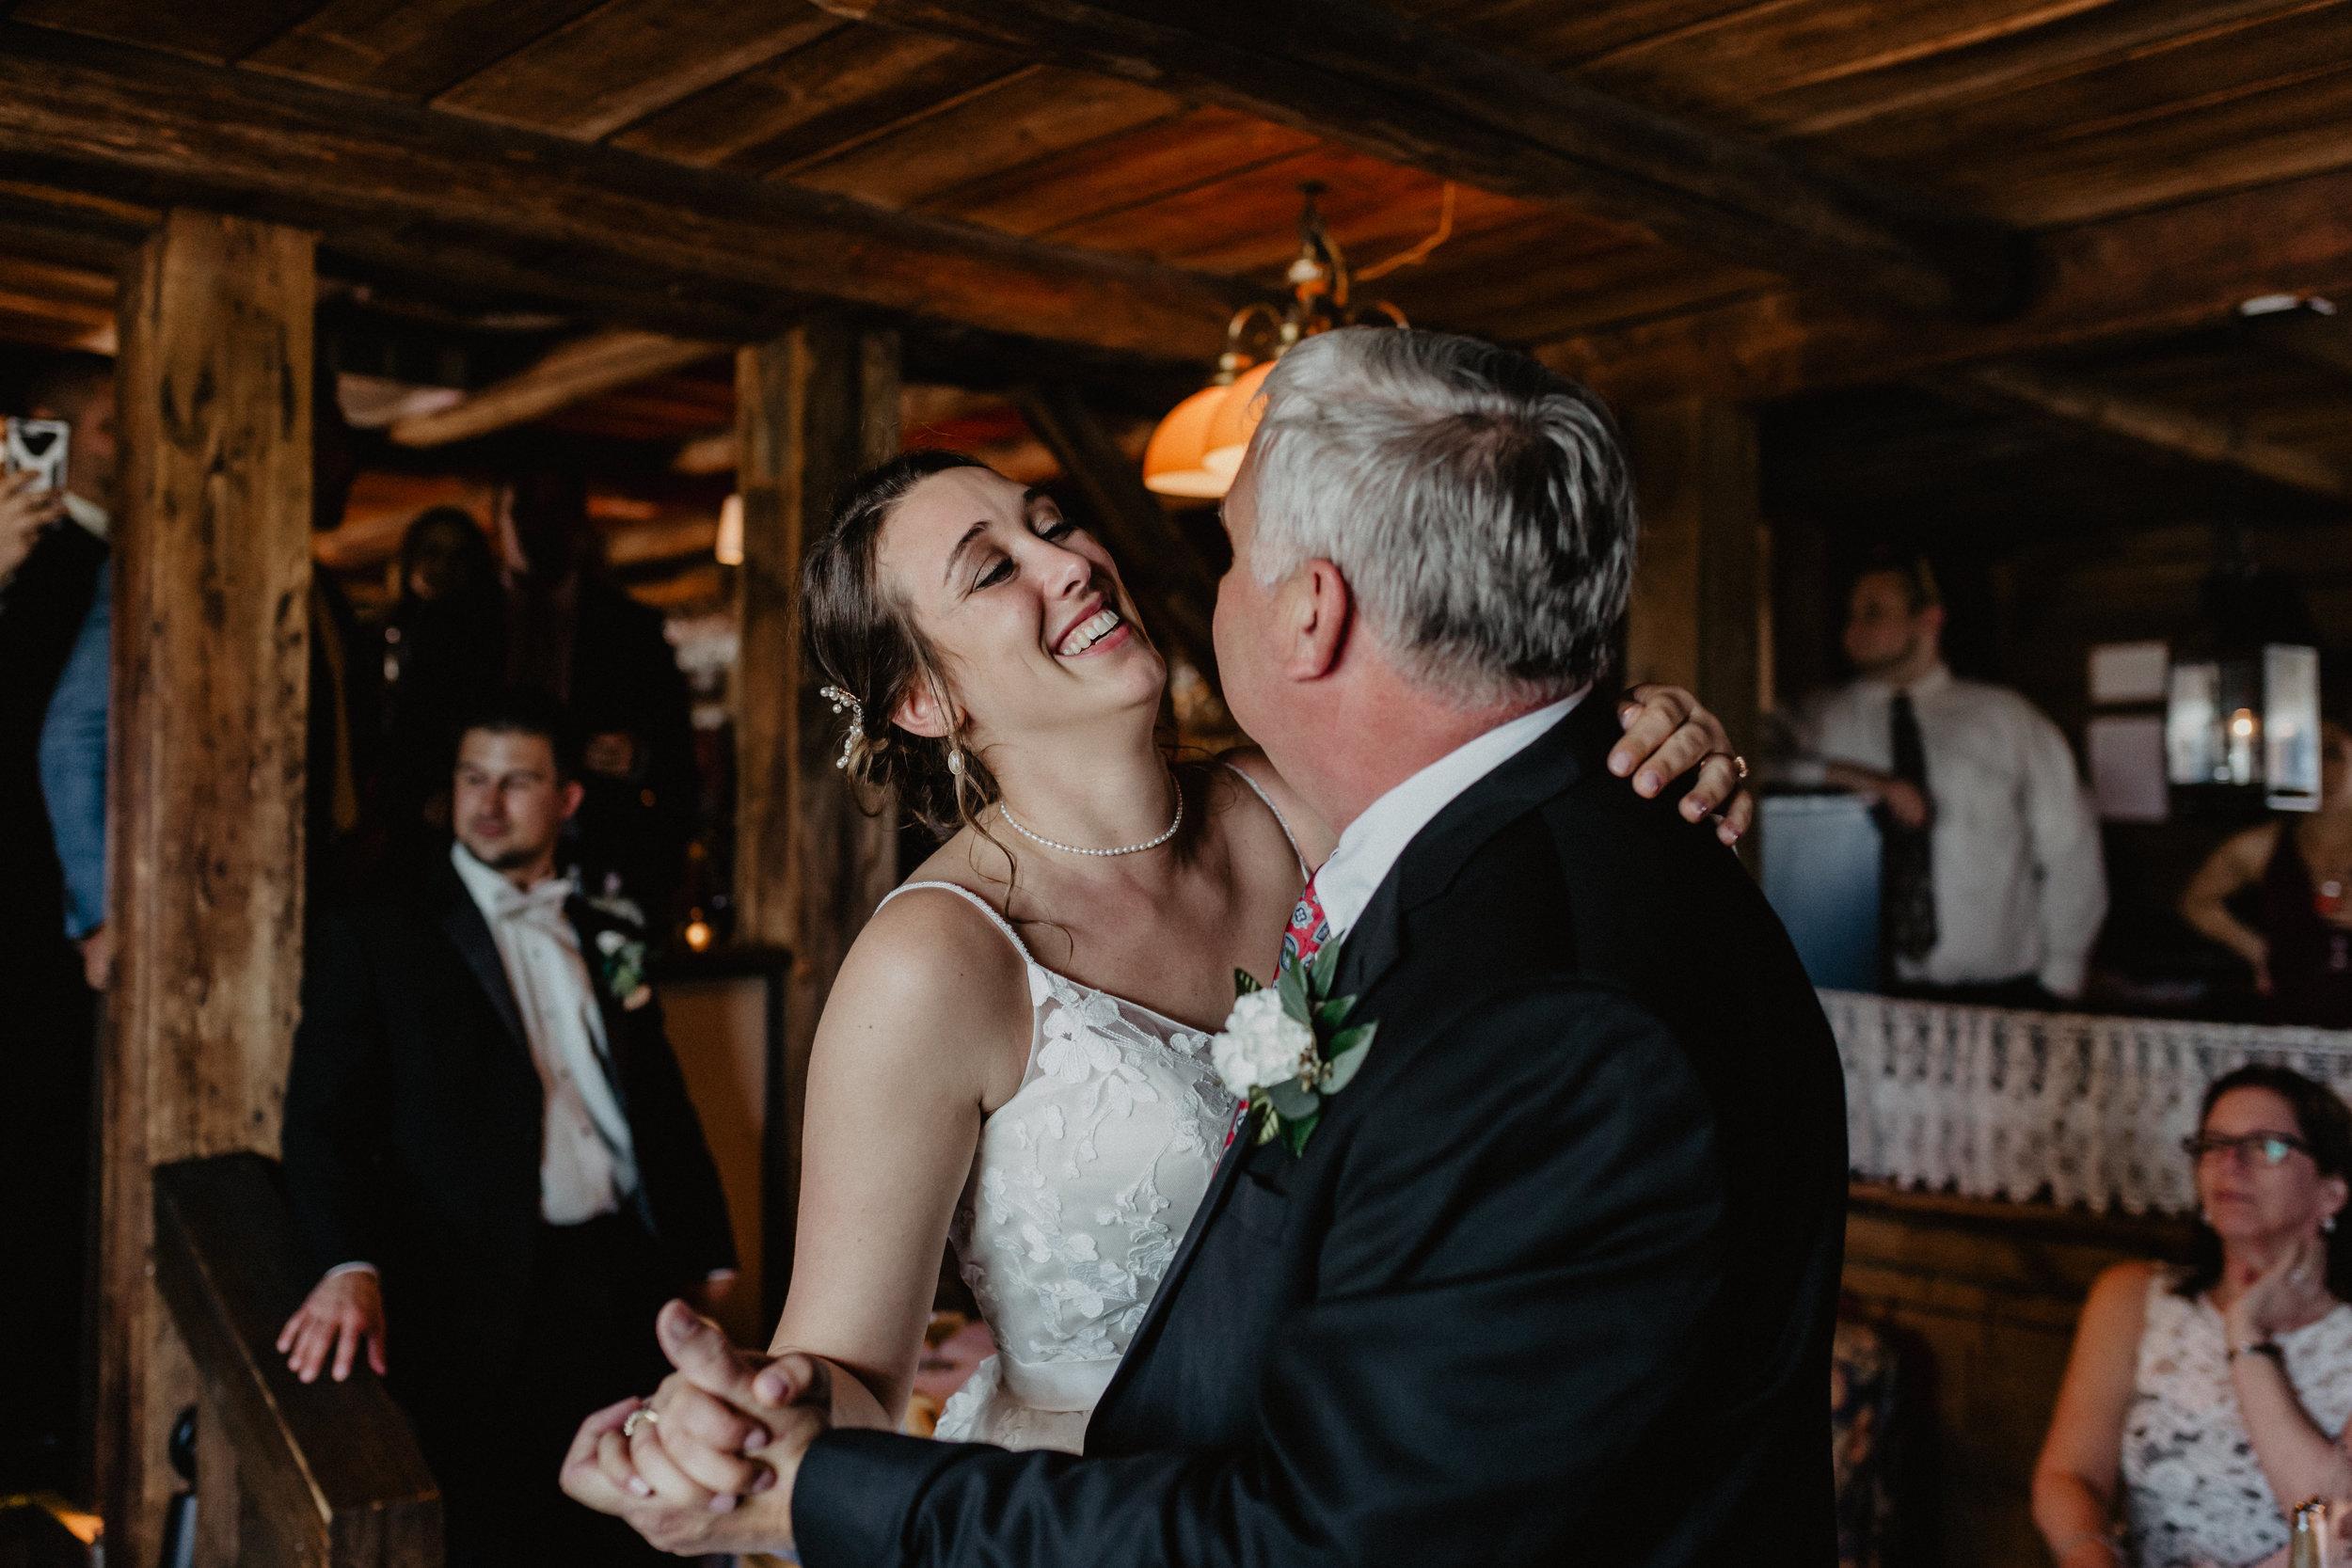 upstate_ny_wedding-47.jpg